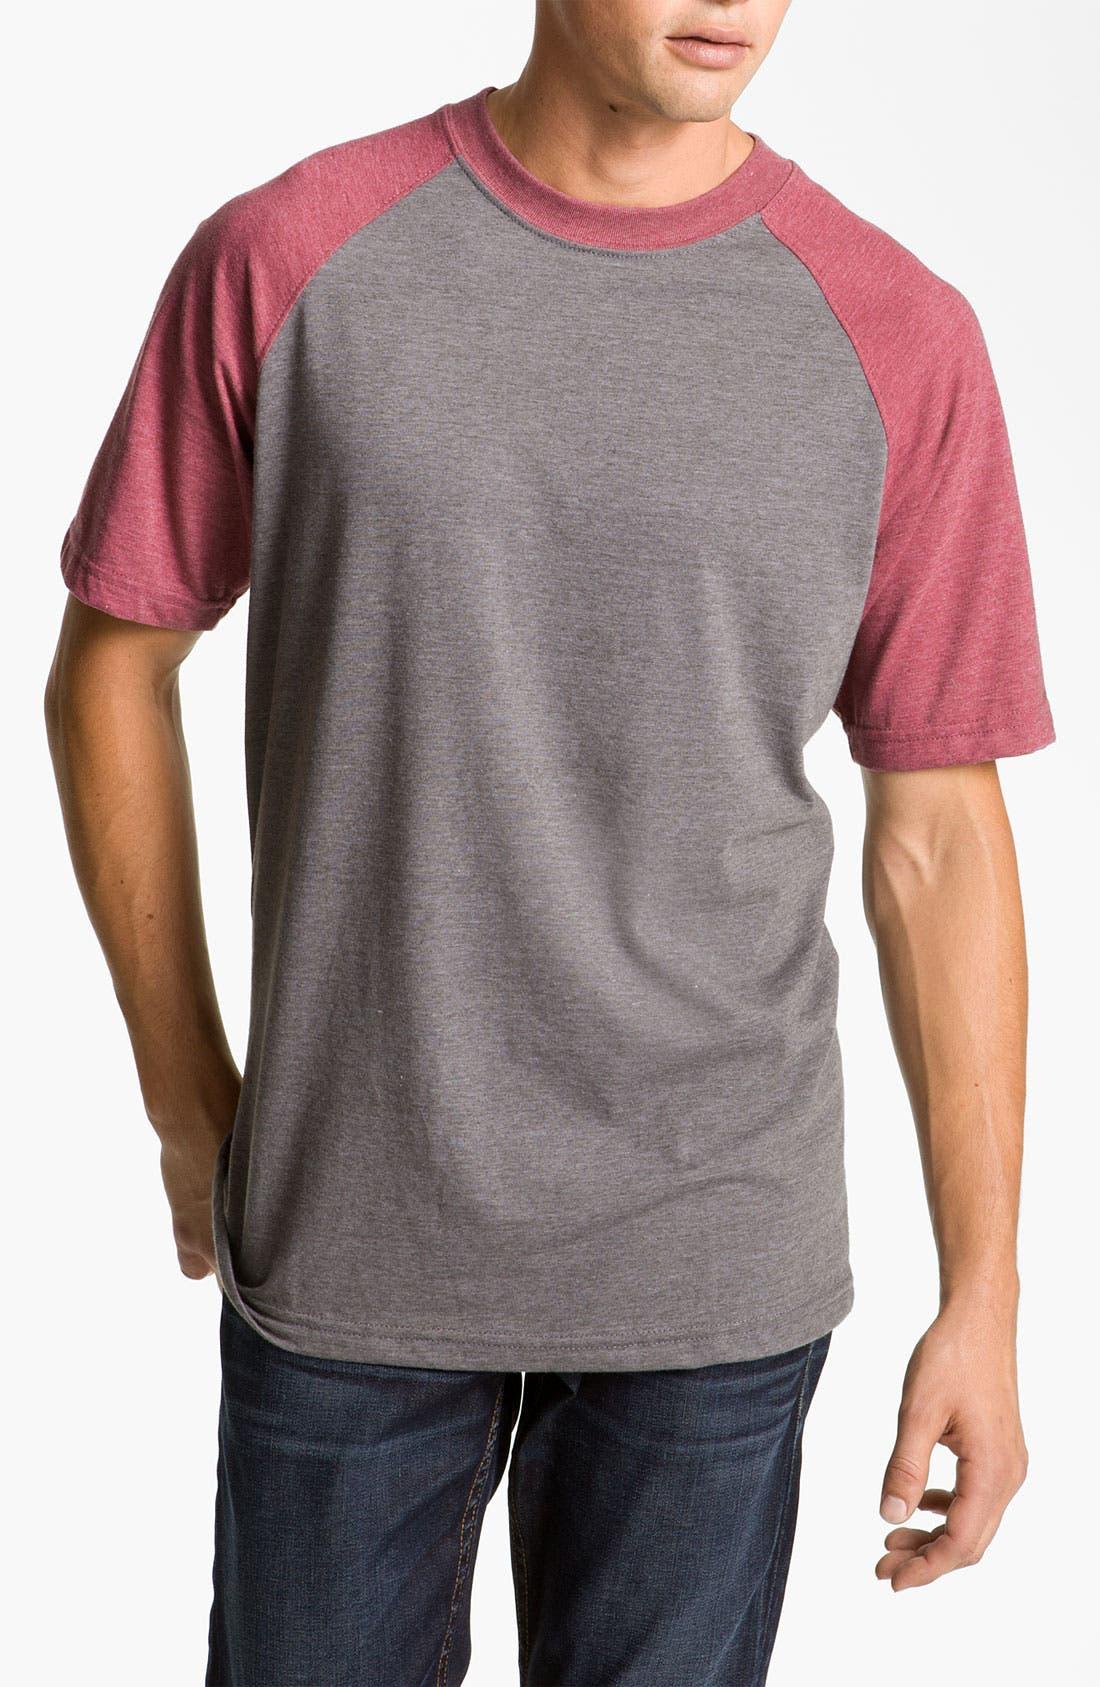 Main Image - RVCA 'Camby' Raglan Short Sleeve T-Shirt